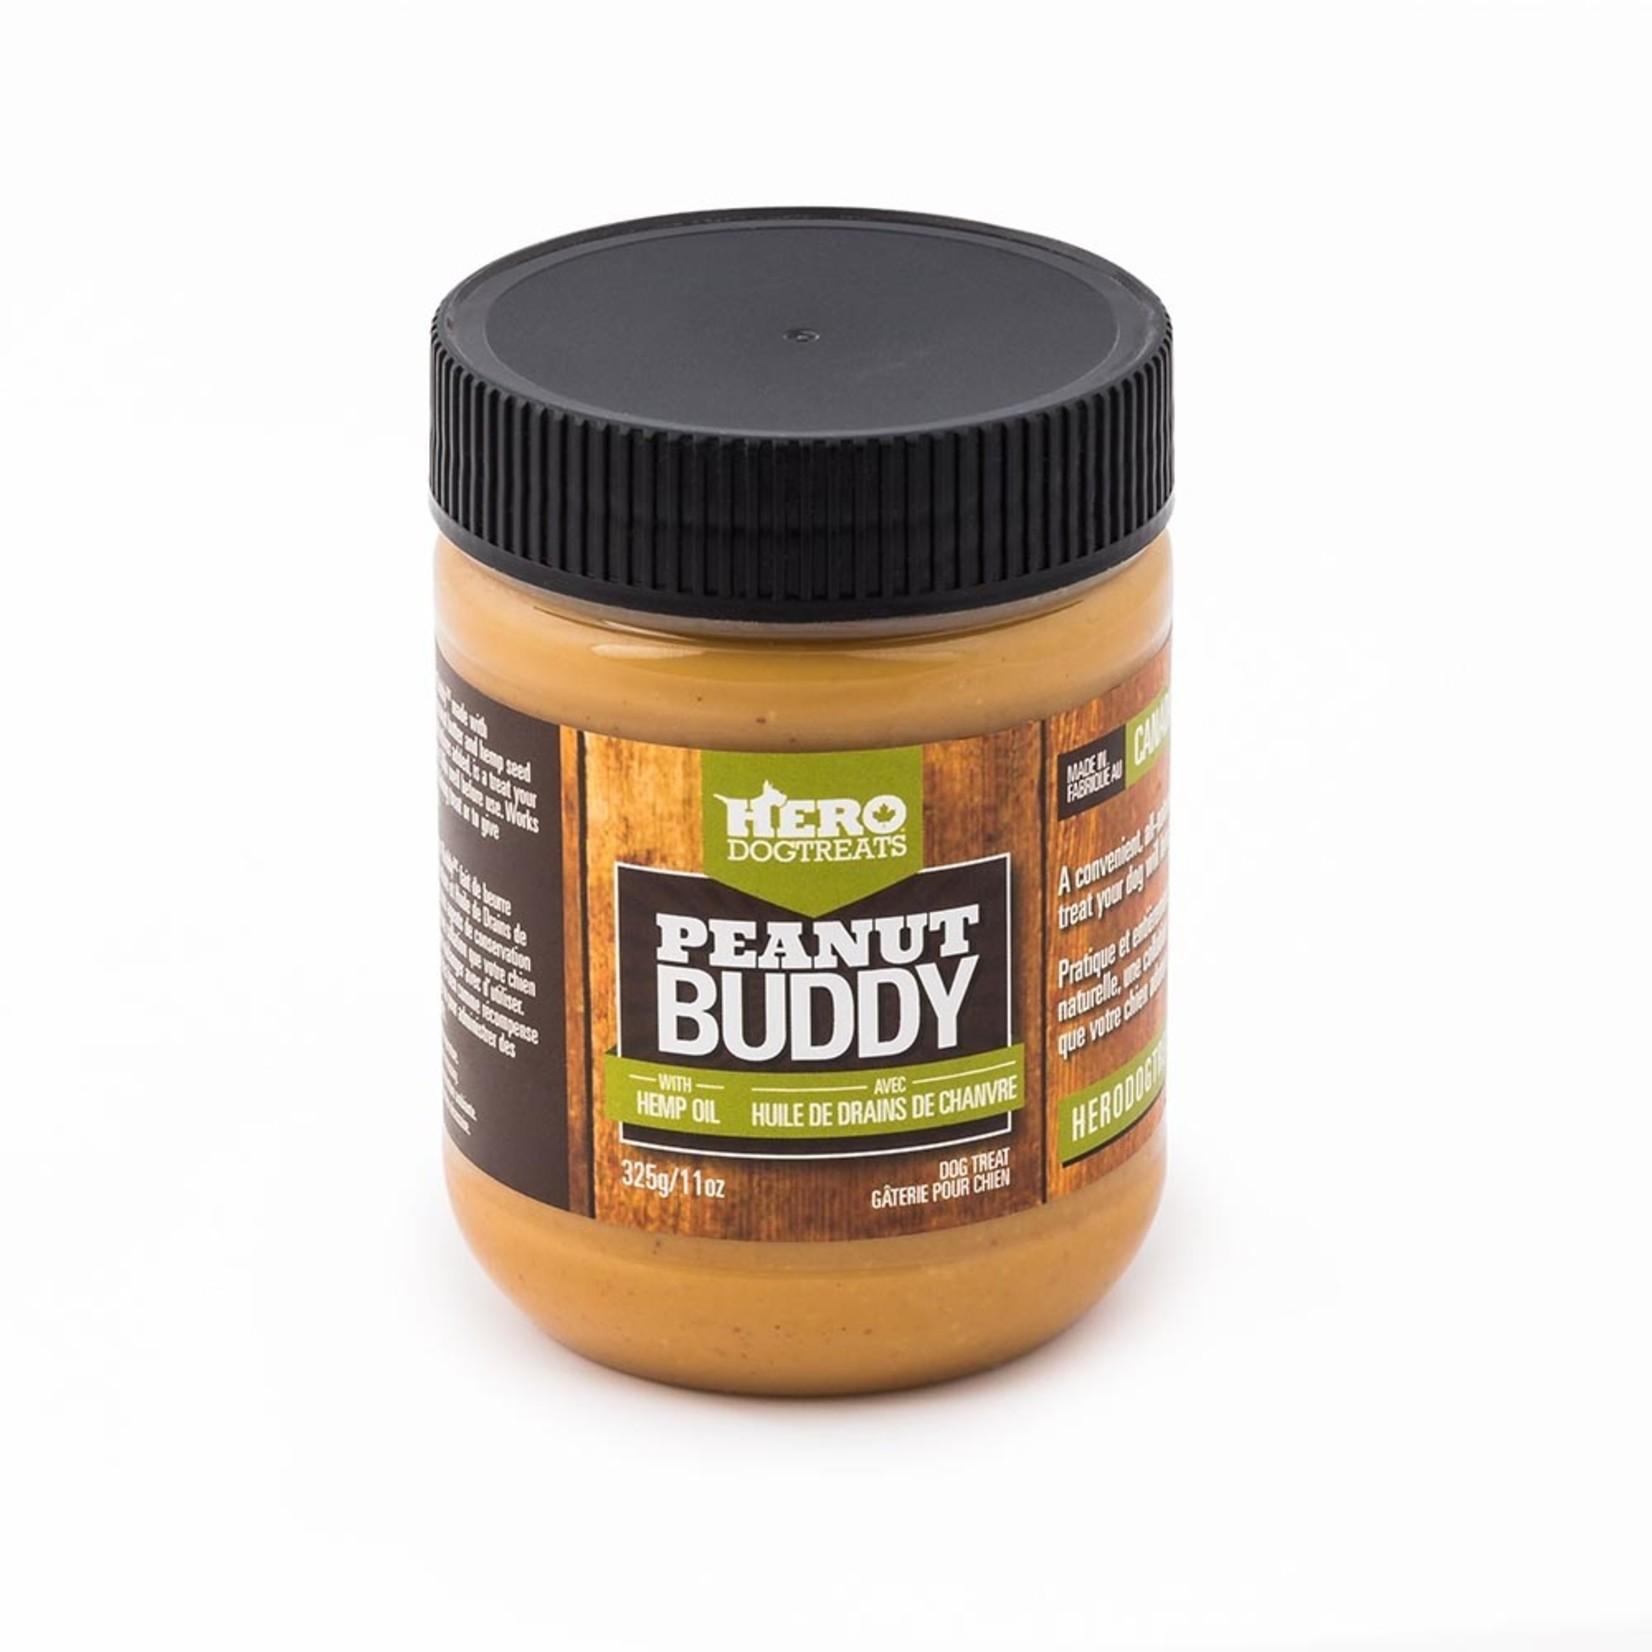 HERO Peanut Buddy-Hemp Oil